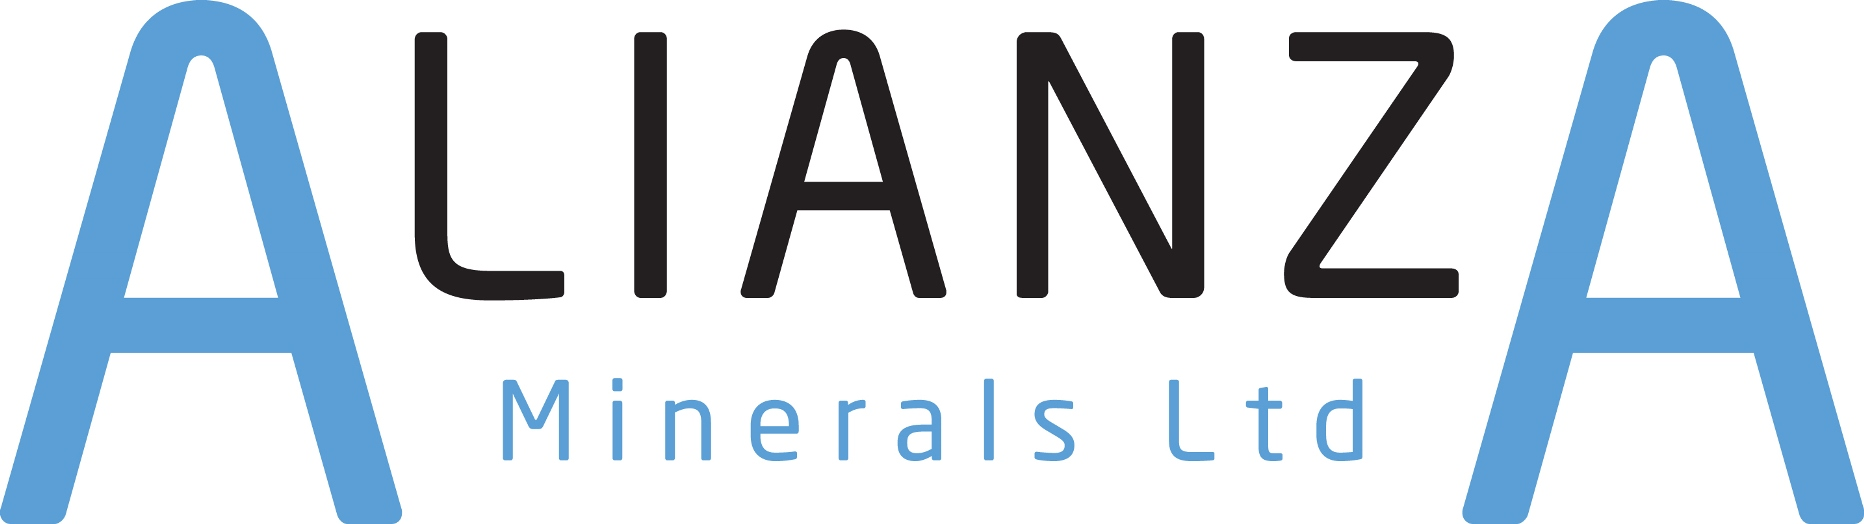 Alianza Minerals Financing Increased to $1 million